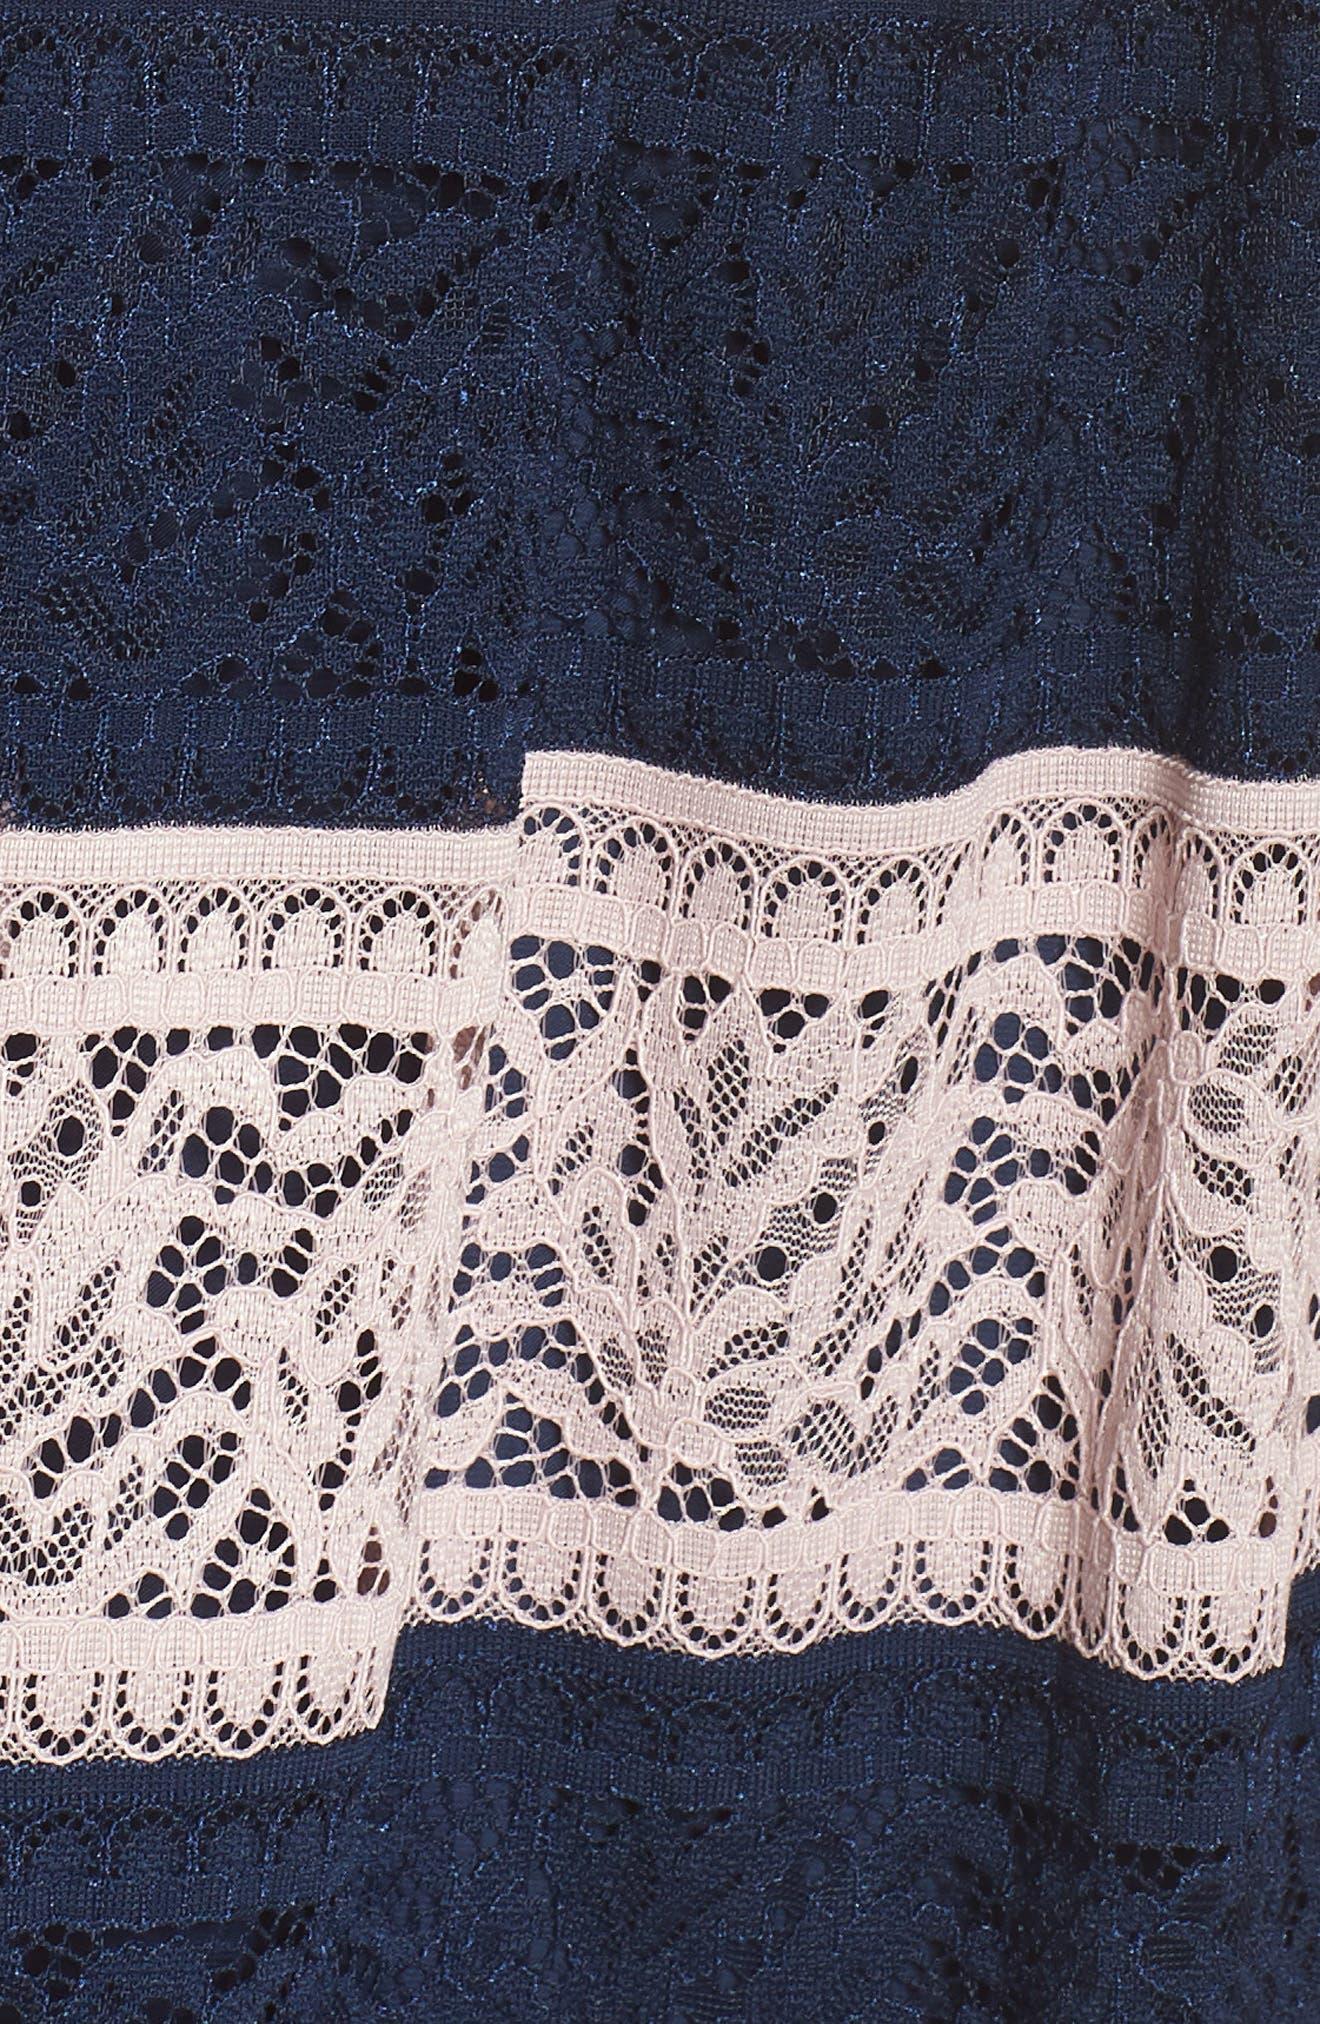 Stripe Lace Fit & Flare Dress,                             Alternate thumbnail 6, color,                             410